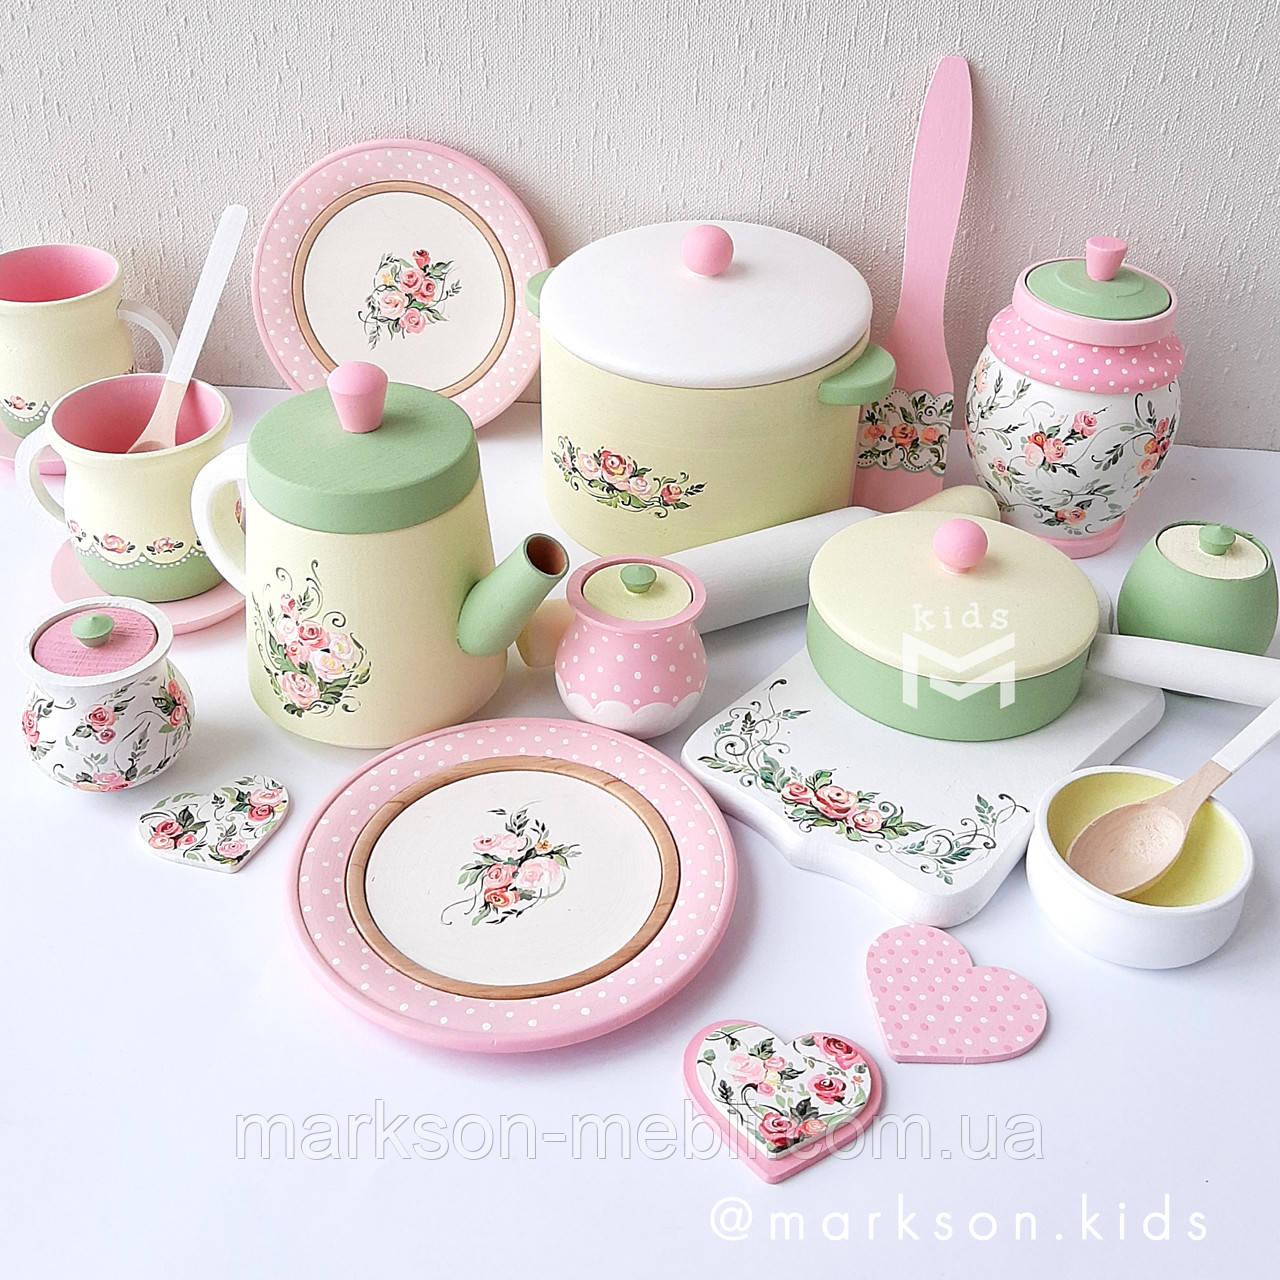 Игрушечная посуда Markson kids - Summer